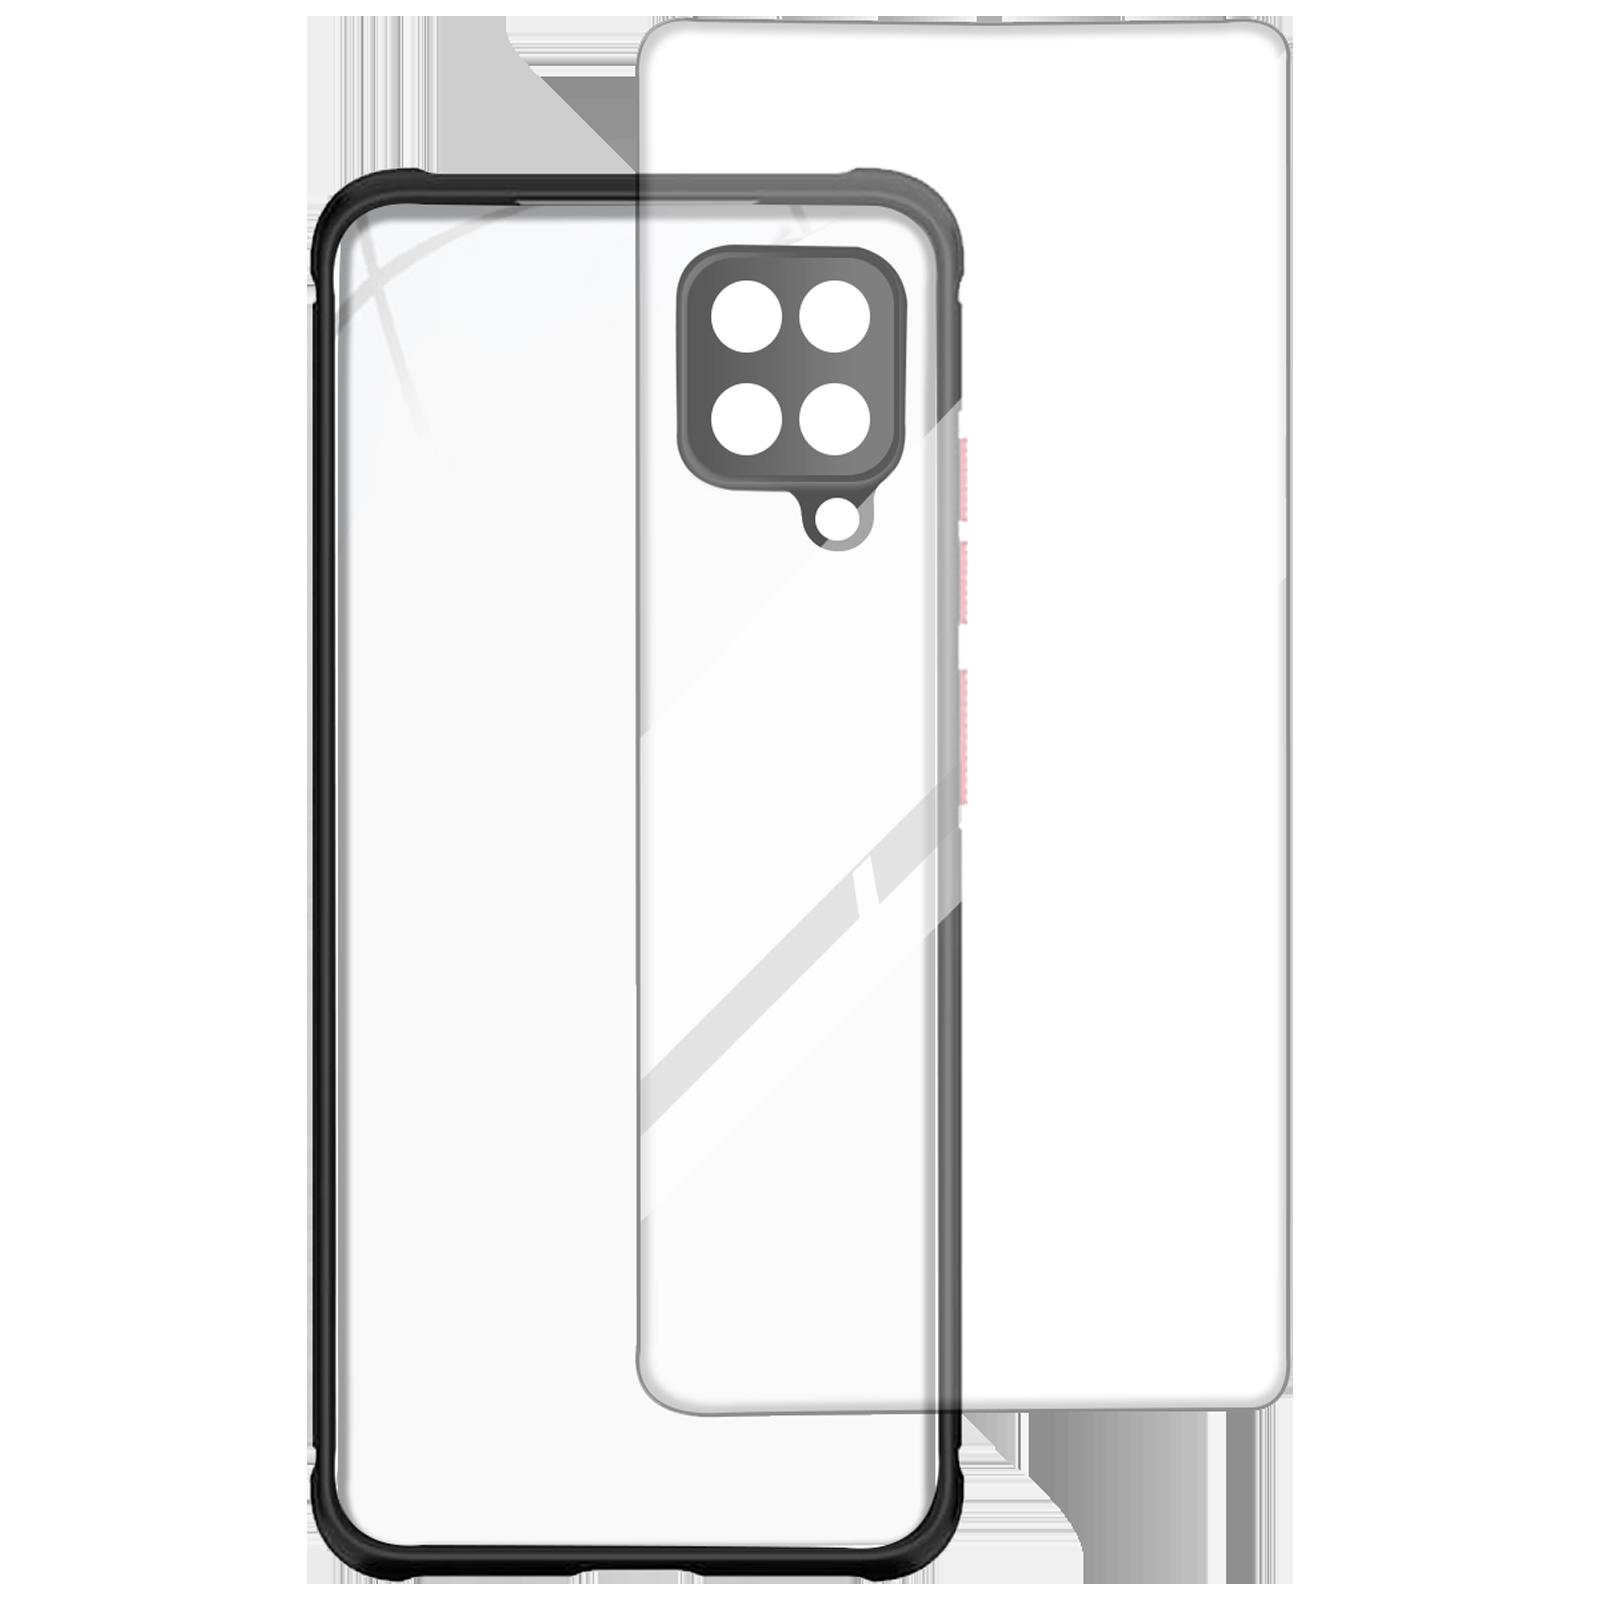 Arrow Hybrid Back Case and Screen Protector Bundle For Samsung Galaxy A12 (Ultra Transparent Visibility, AR-1048, Black)_1